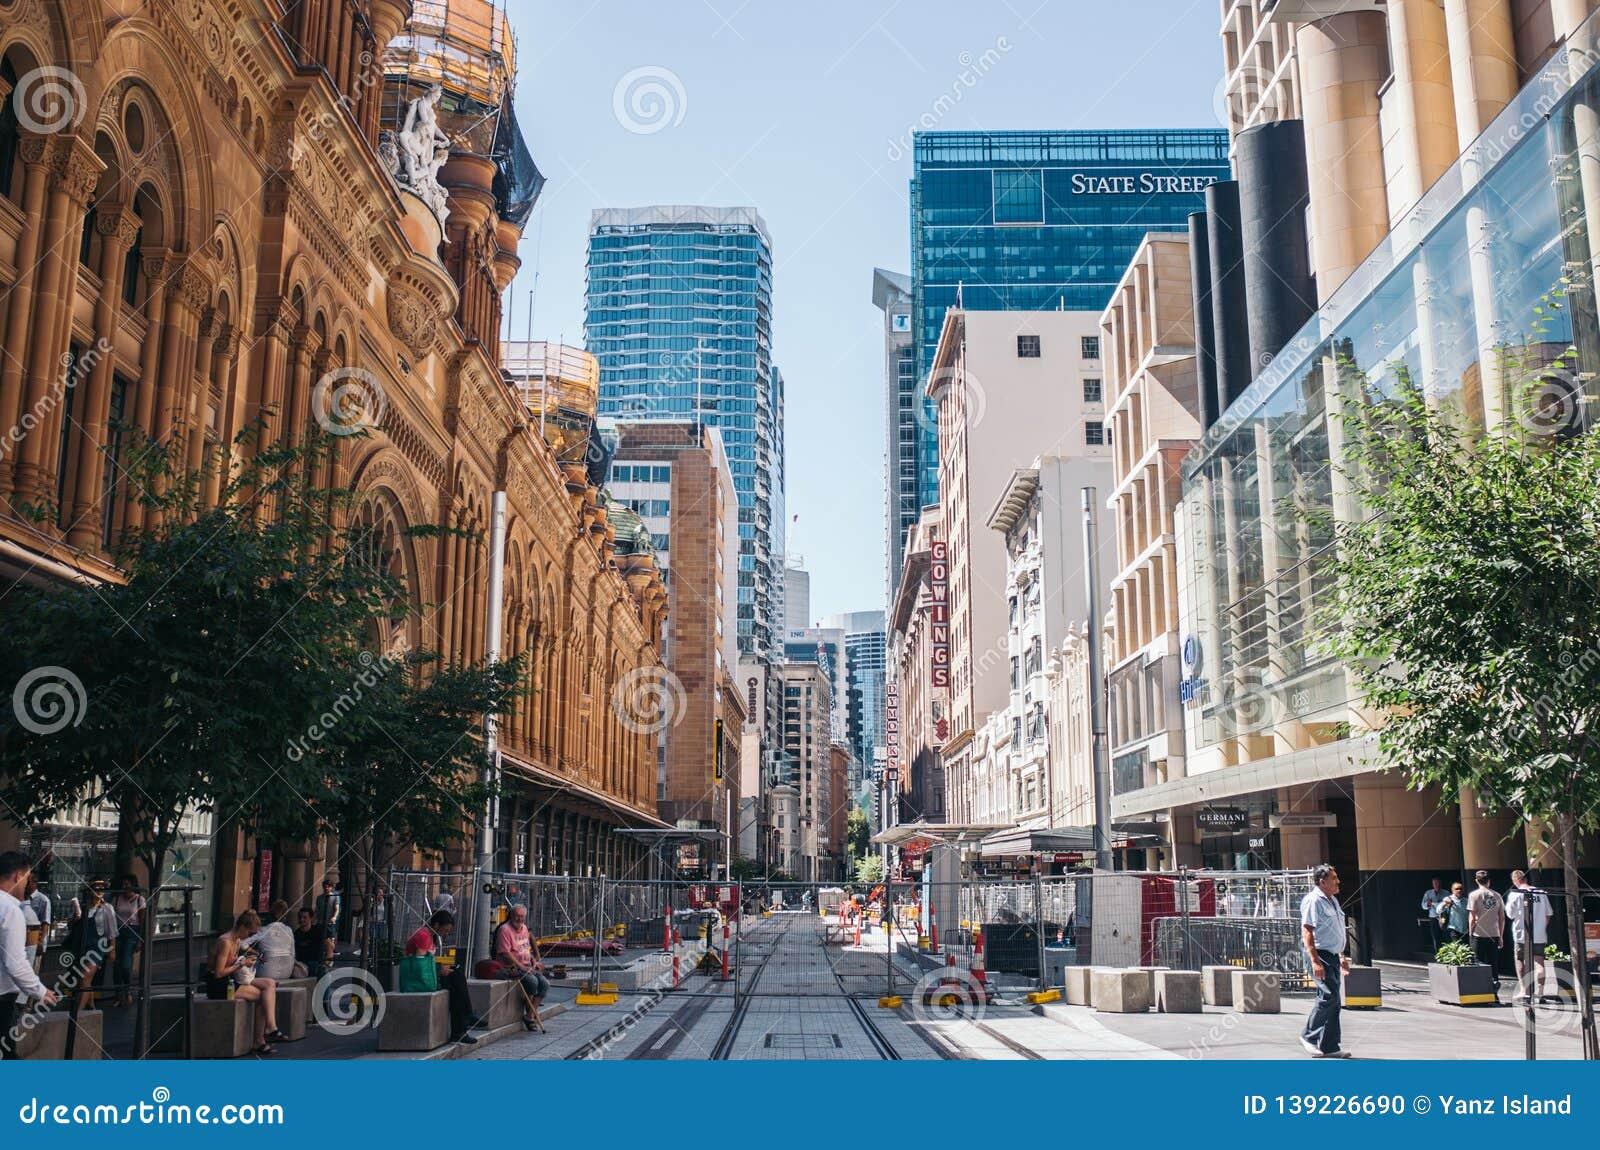 Sydney Pitt St Mall